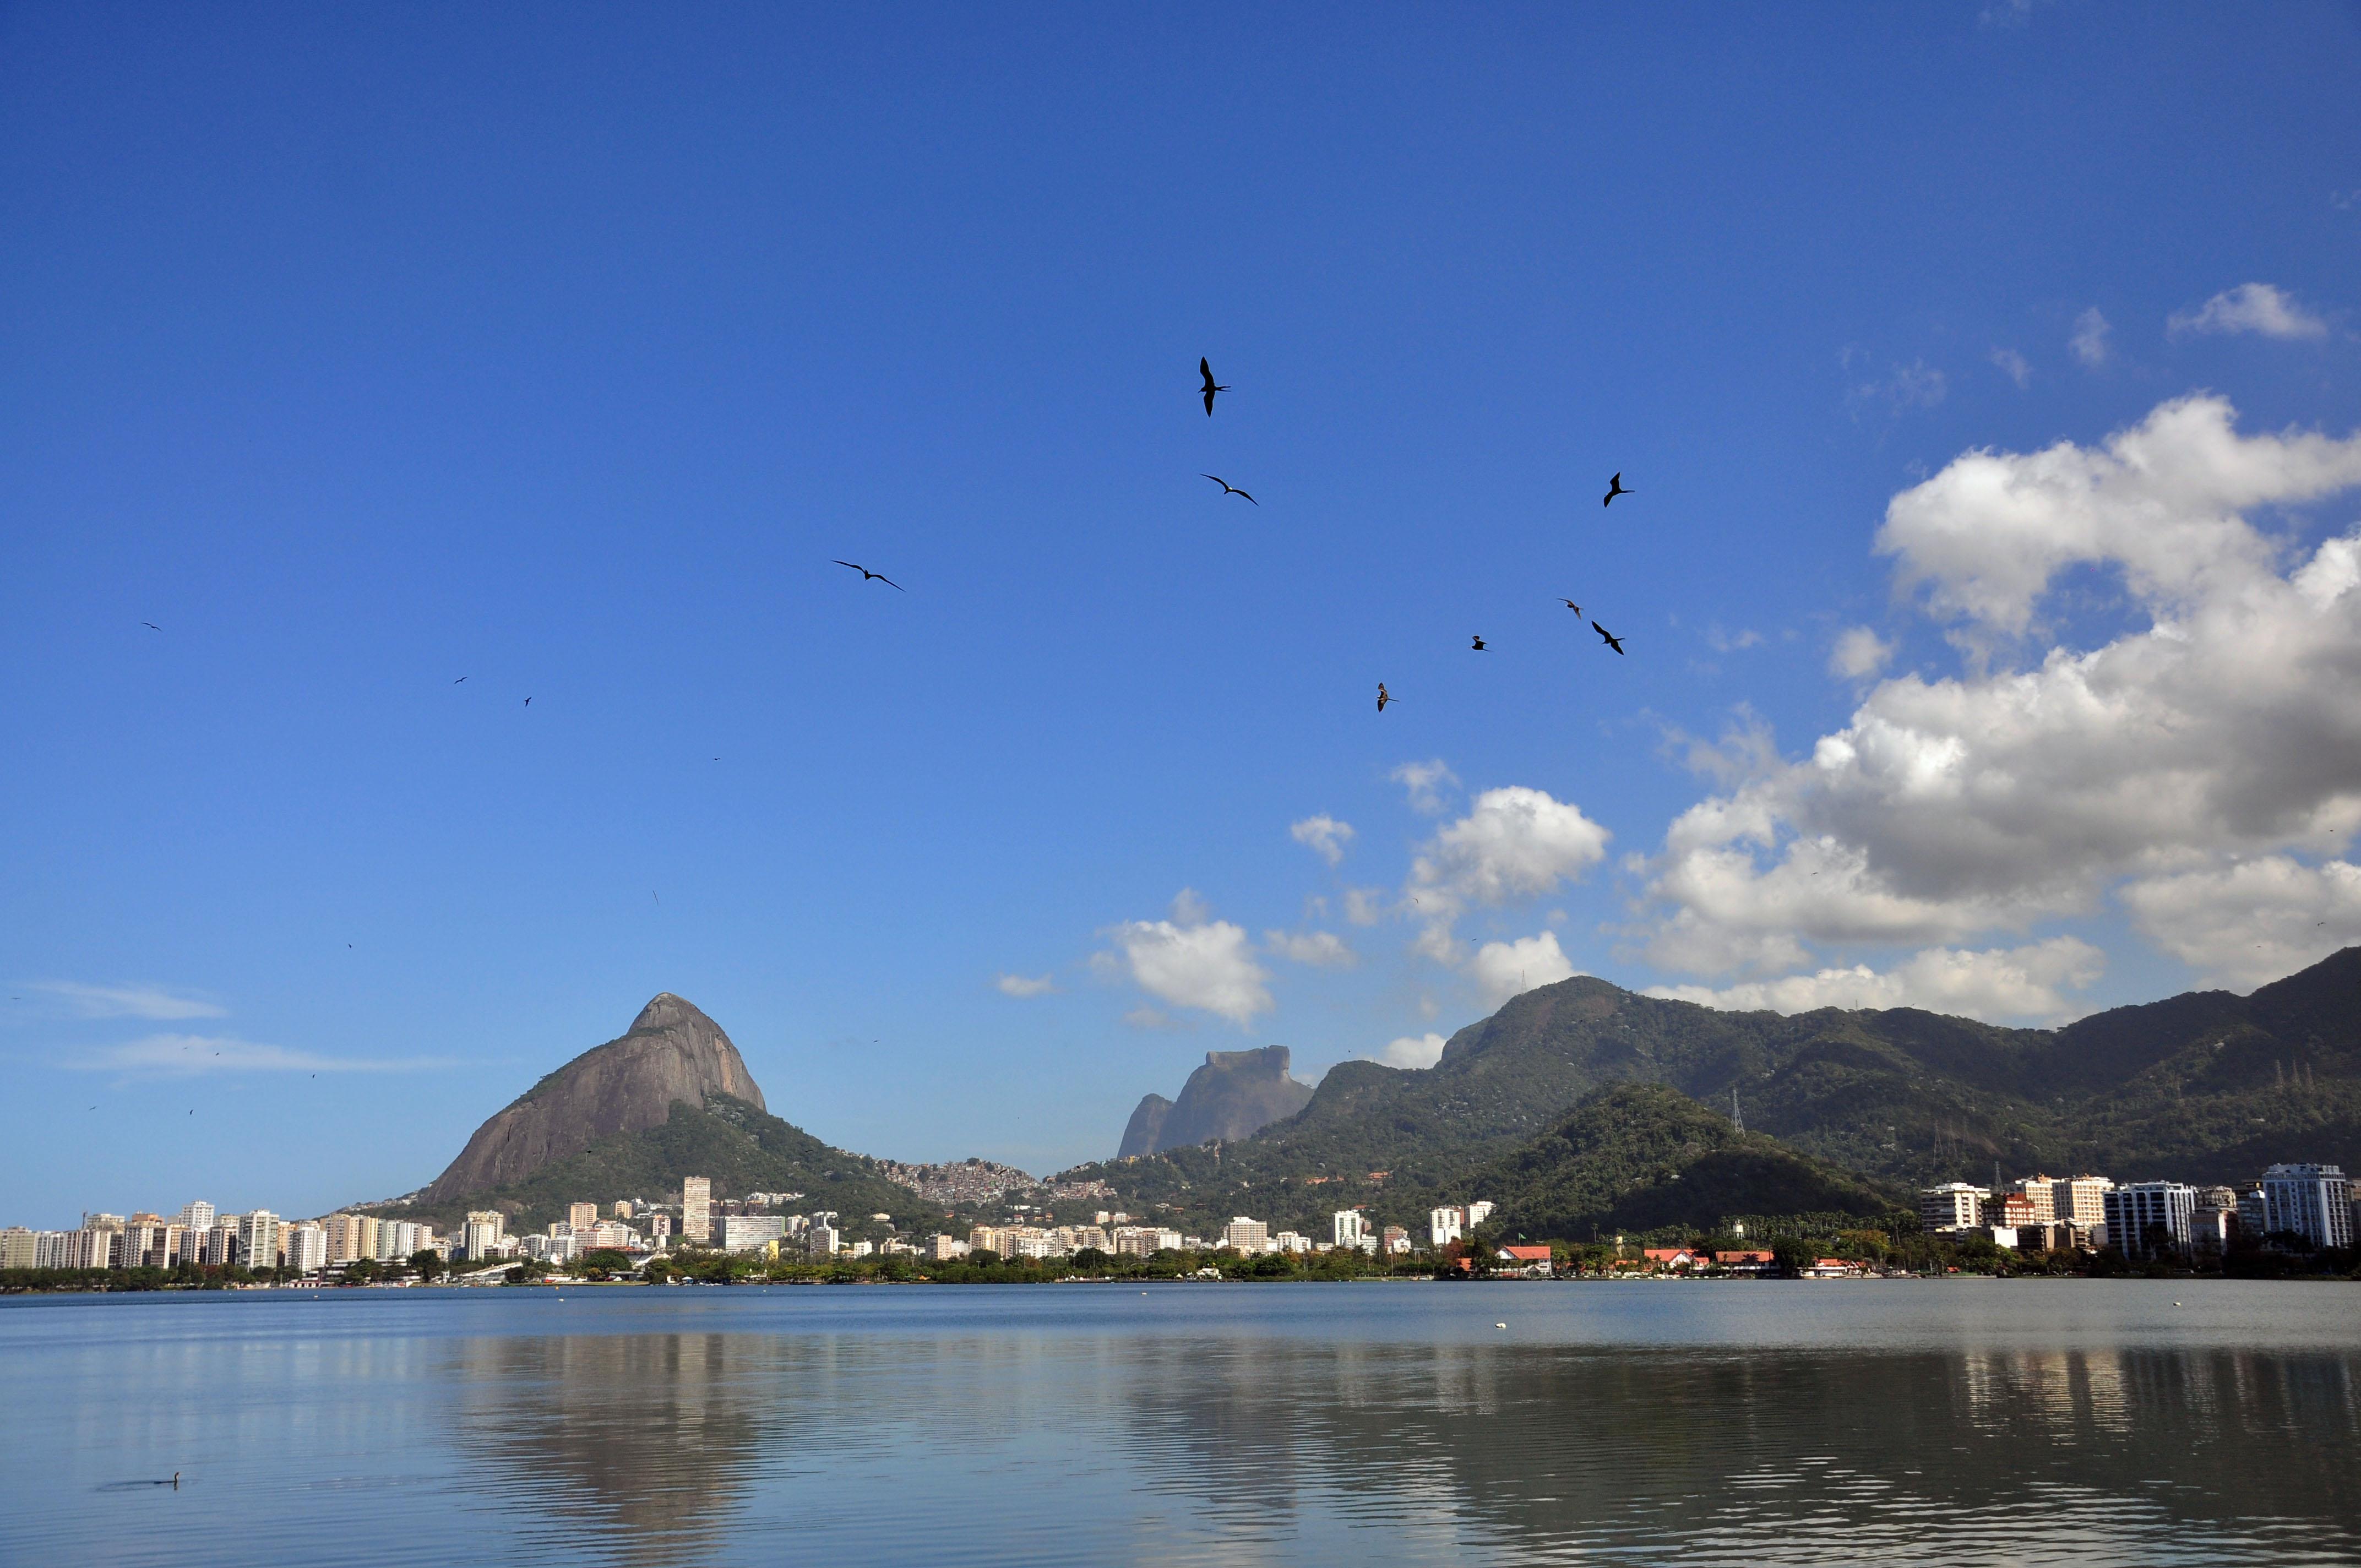 Foto mostra Lagoa Rodrigo de Freitas